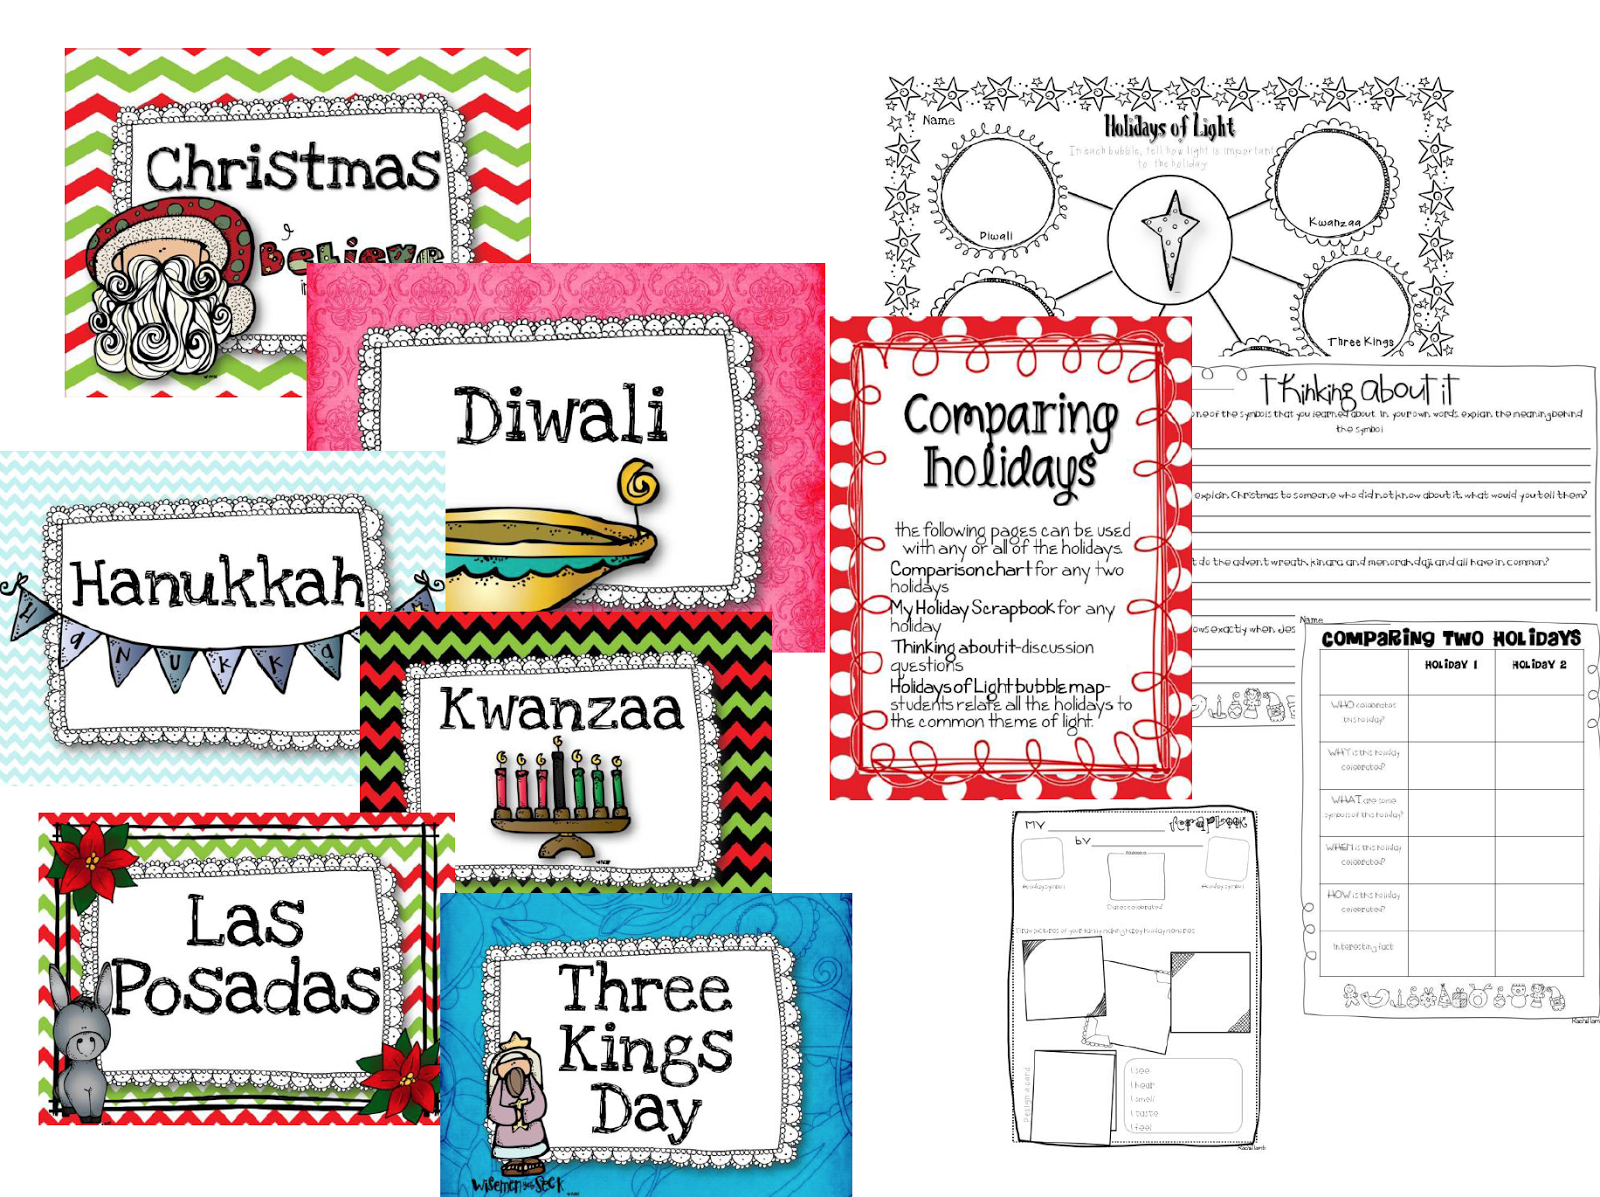 Workbooks las posadas worksheets : Blog Hoppin': In a Holiday Daze?!